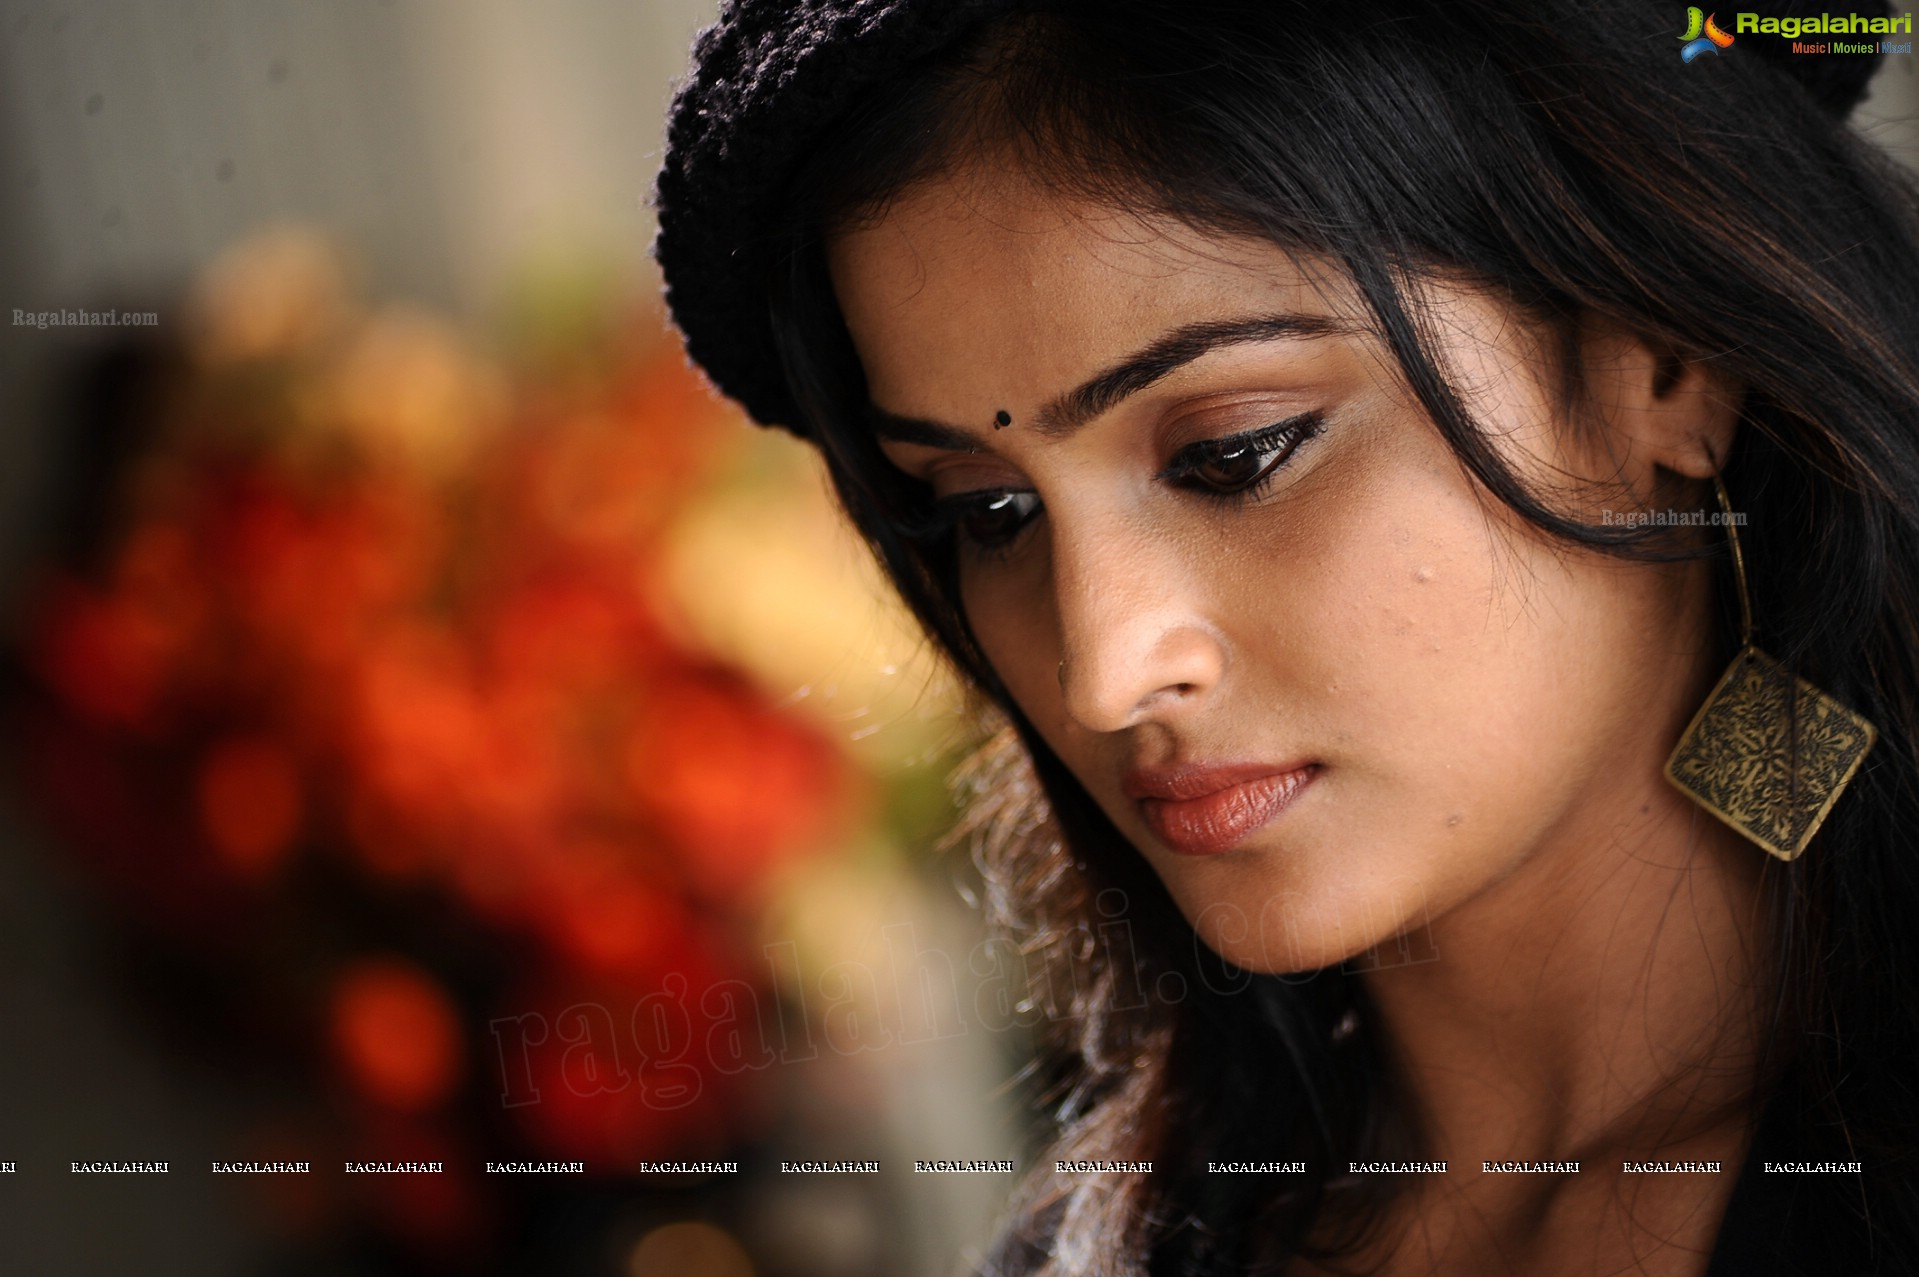 remya nambeesan (hd) image 1 | beautiful tollywood actress photos